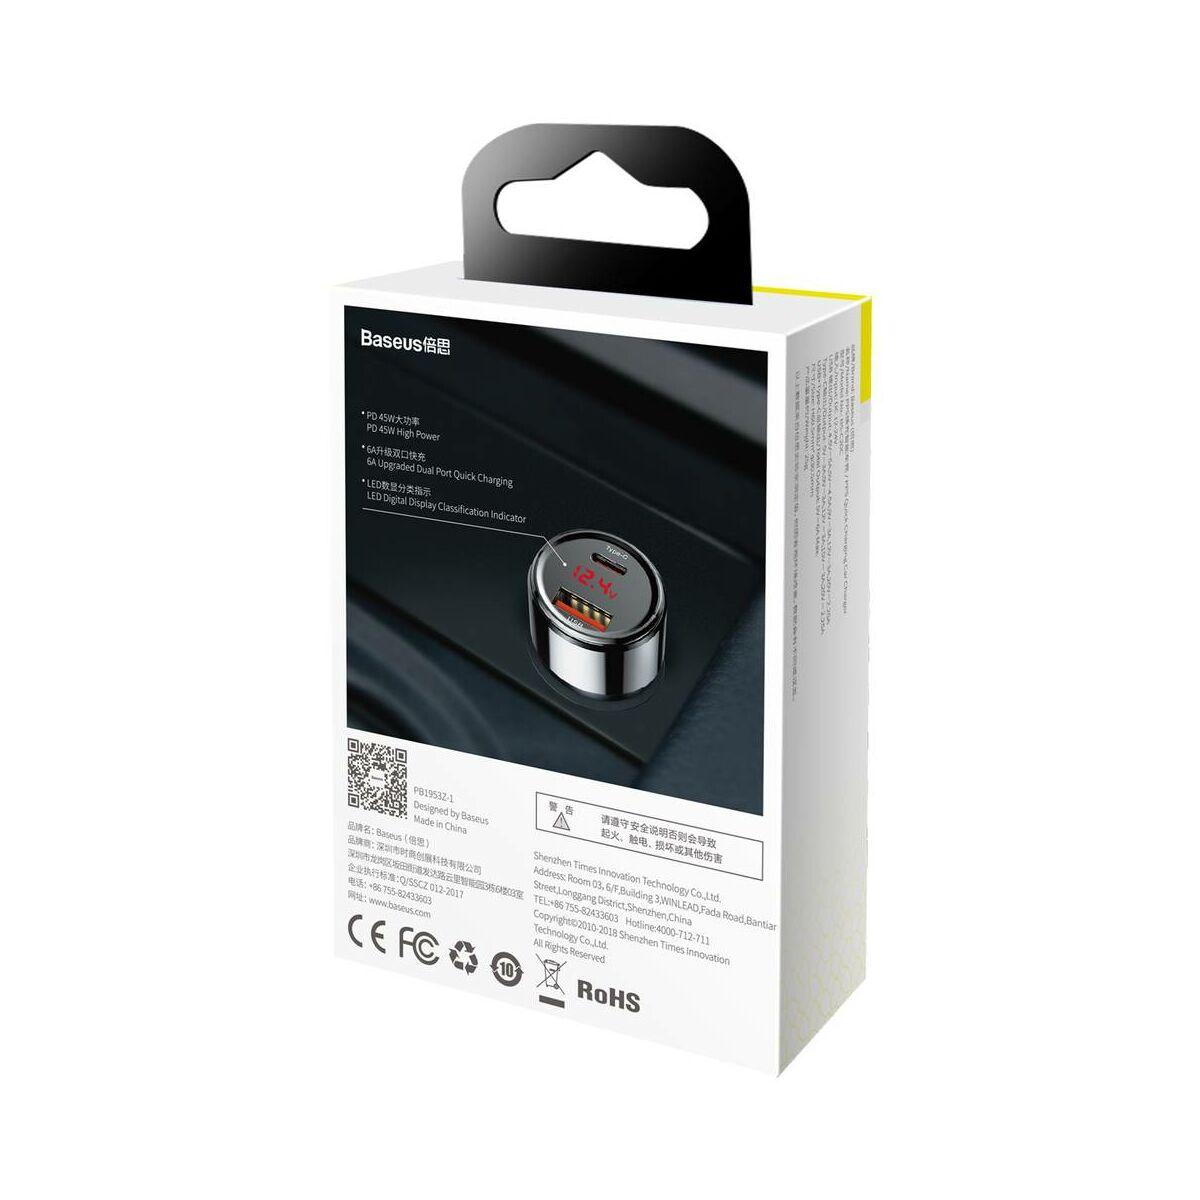 Baseus autós töltő, Magic Series PPS digitális kijelzővel (Type-C PD+Dual QC) 45W, fekete (CCMLC20C-01)